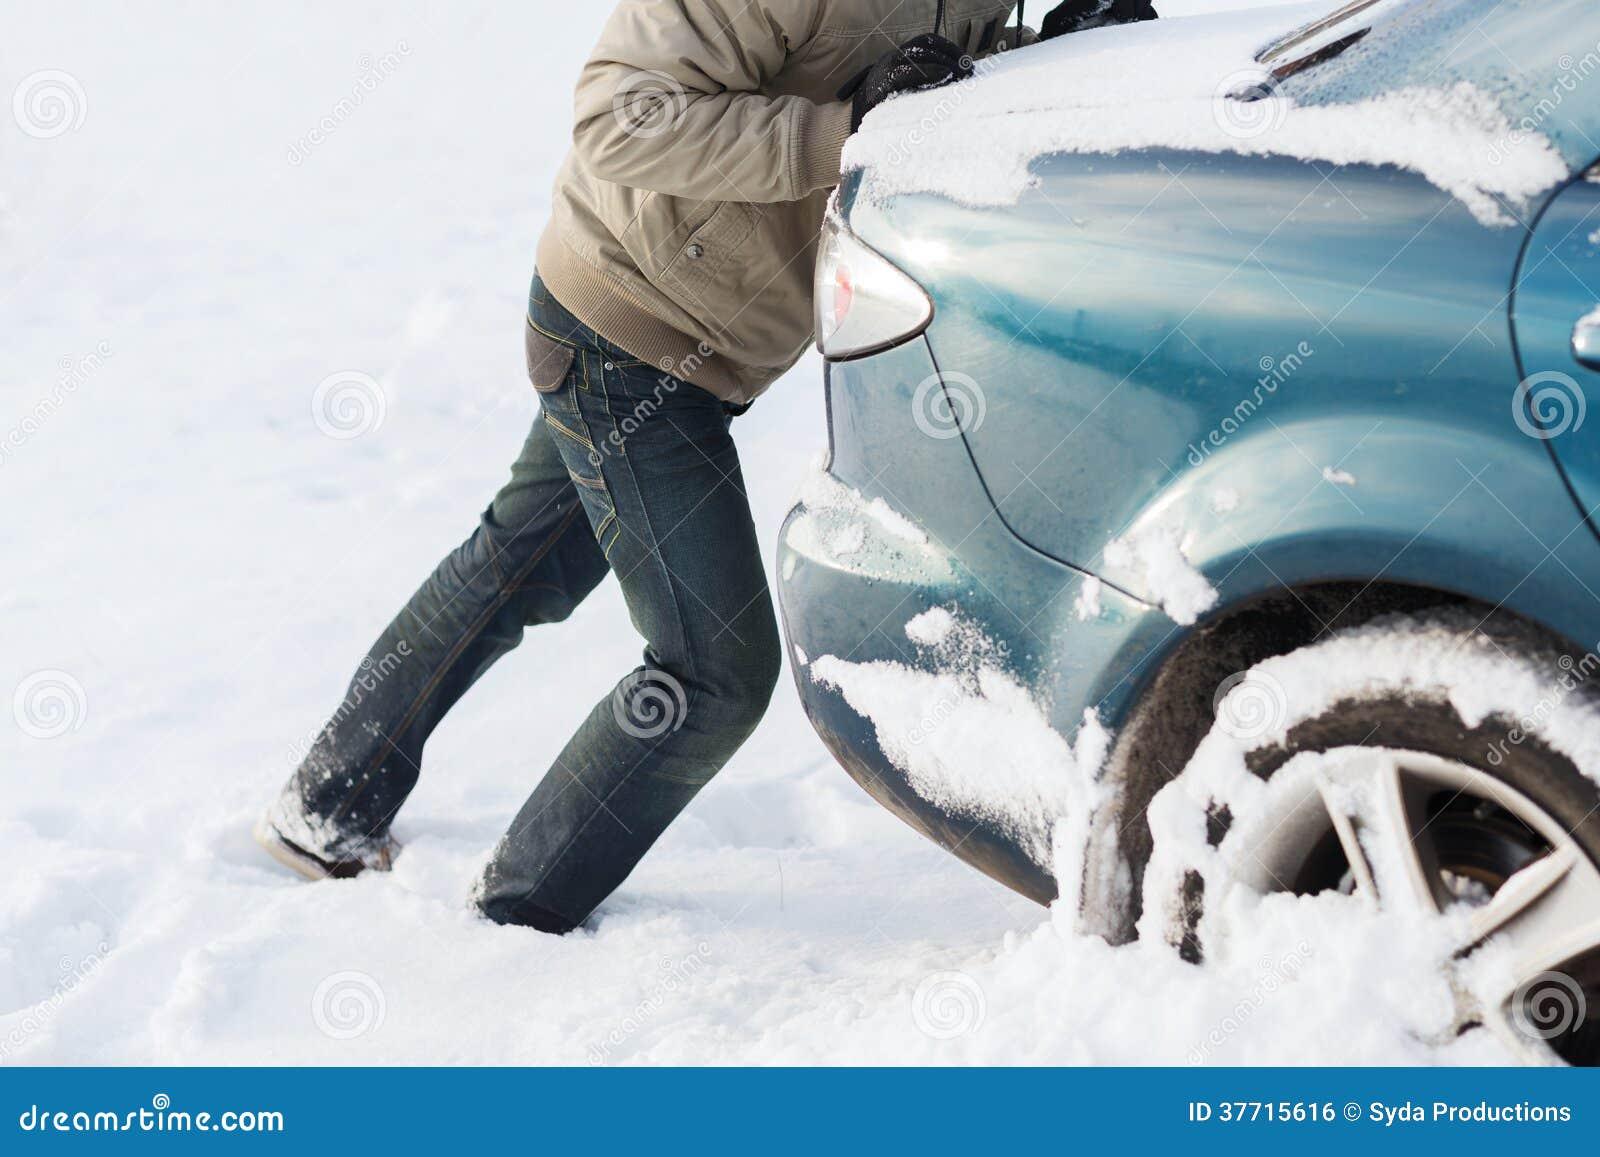 Closeup of Man Pushing Car